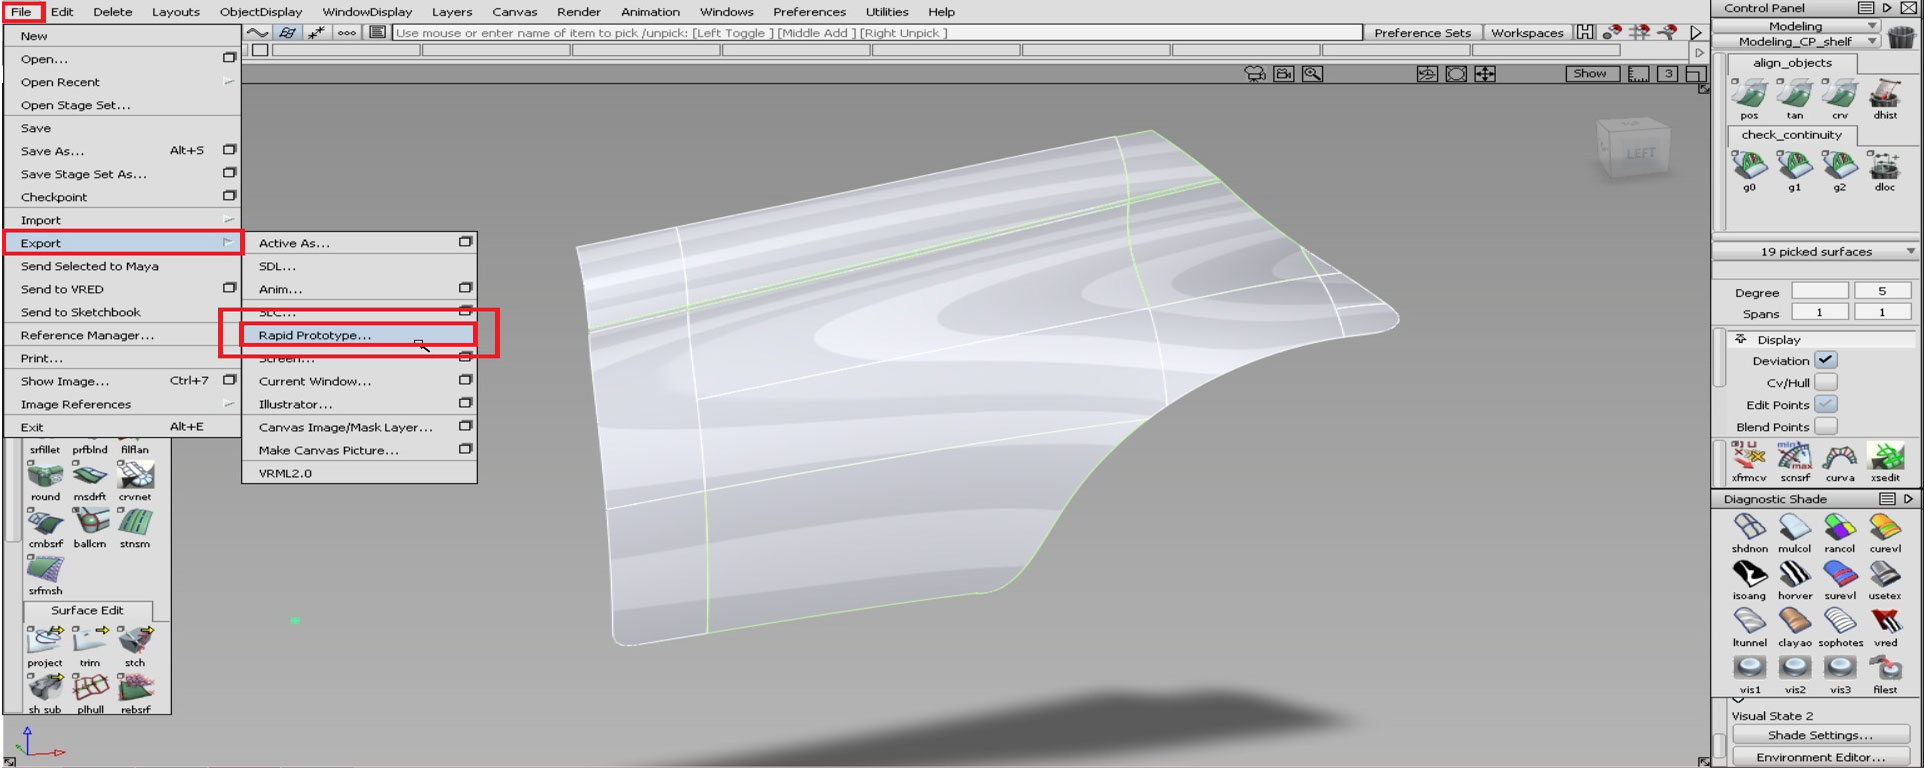 D Printing Exhibition Uk : Autodesk alias converting to stl open surfaces dprintuk